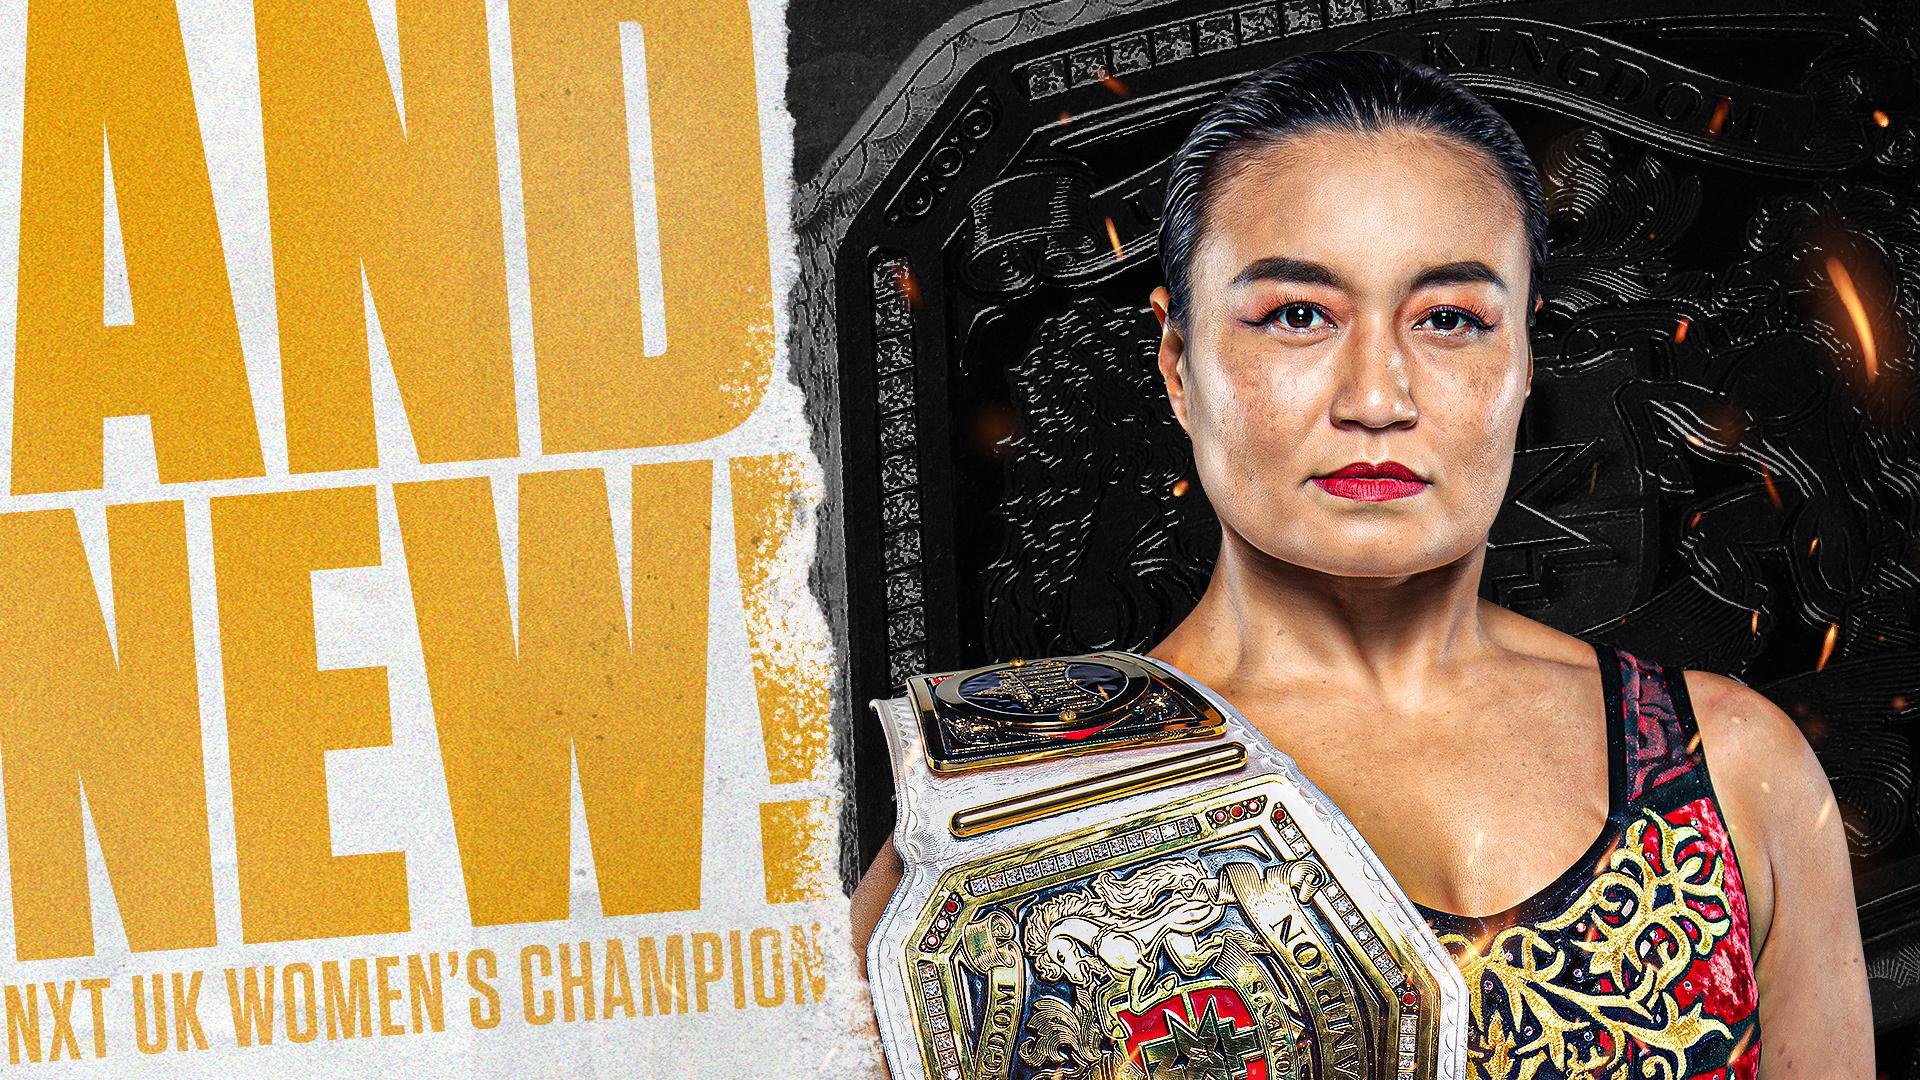 WWE NXT UK Crowns New Women's Champion In Meiko Satomura 2